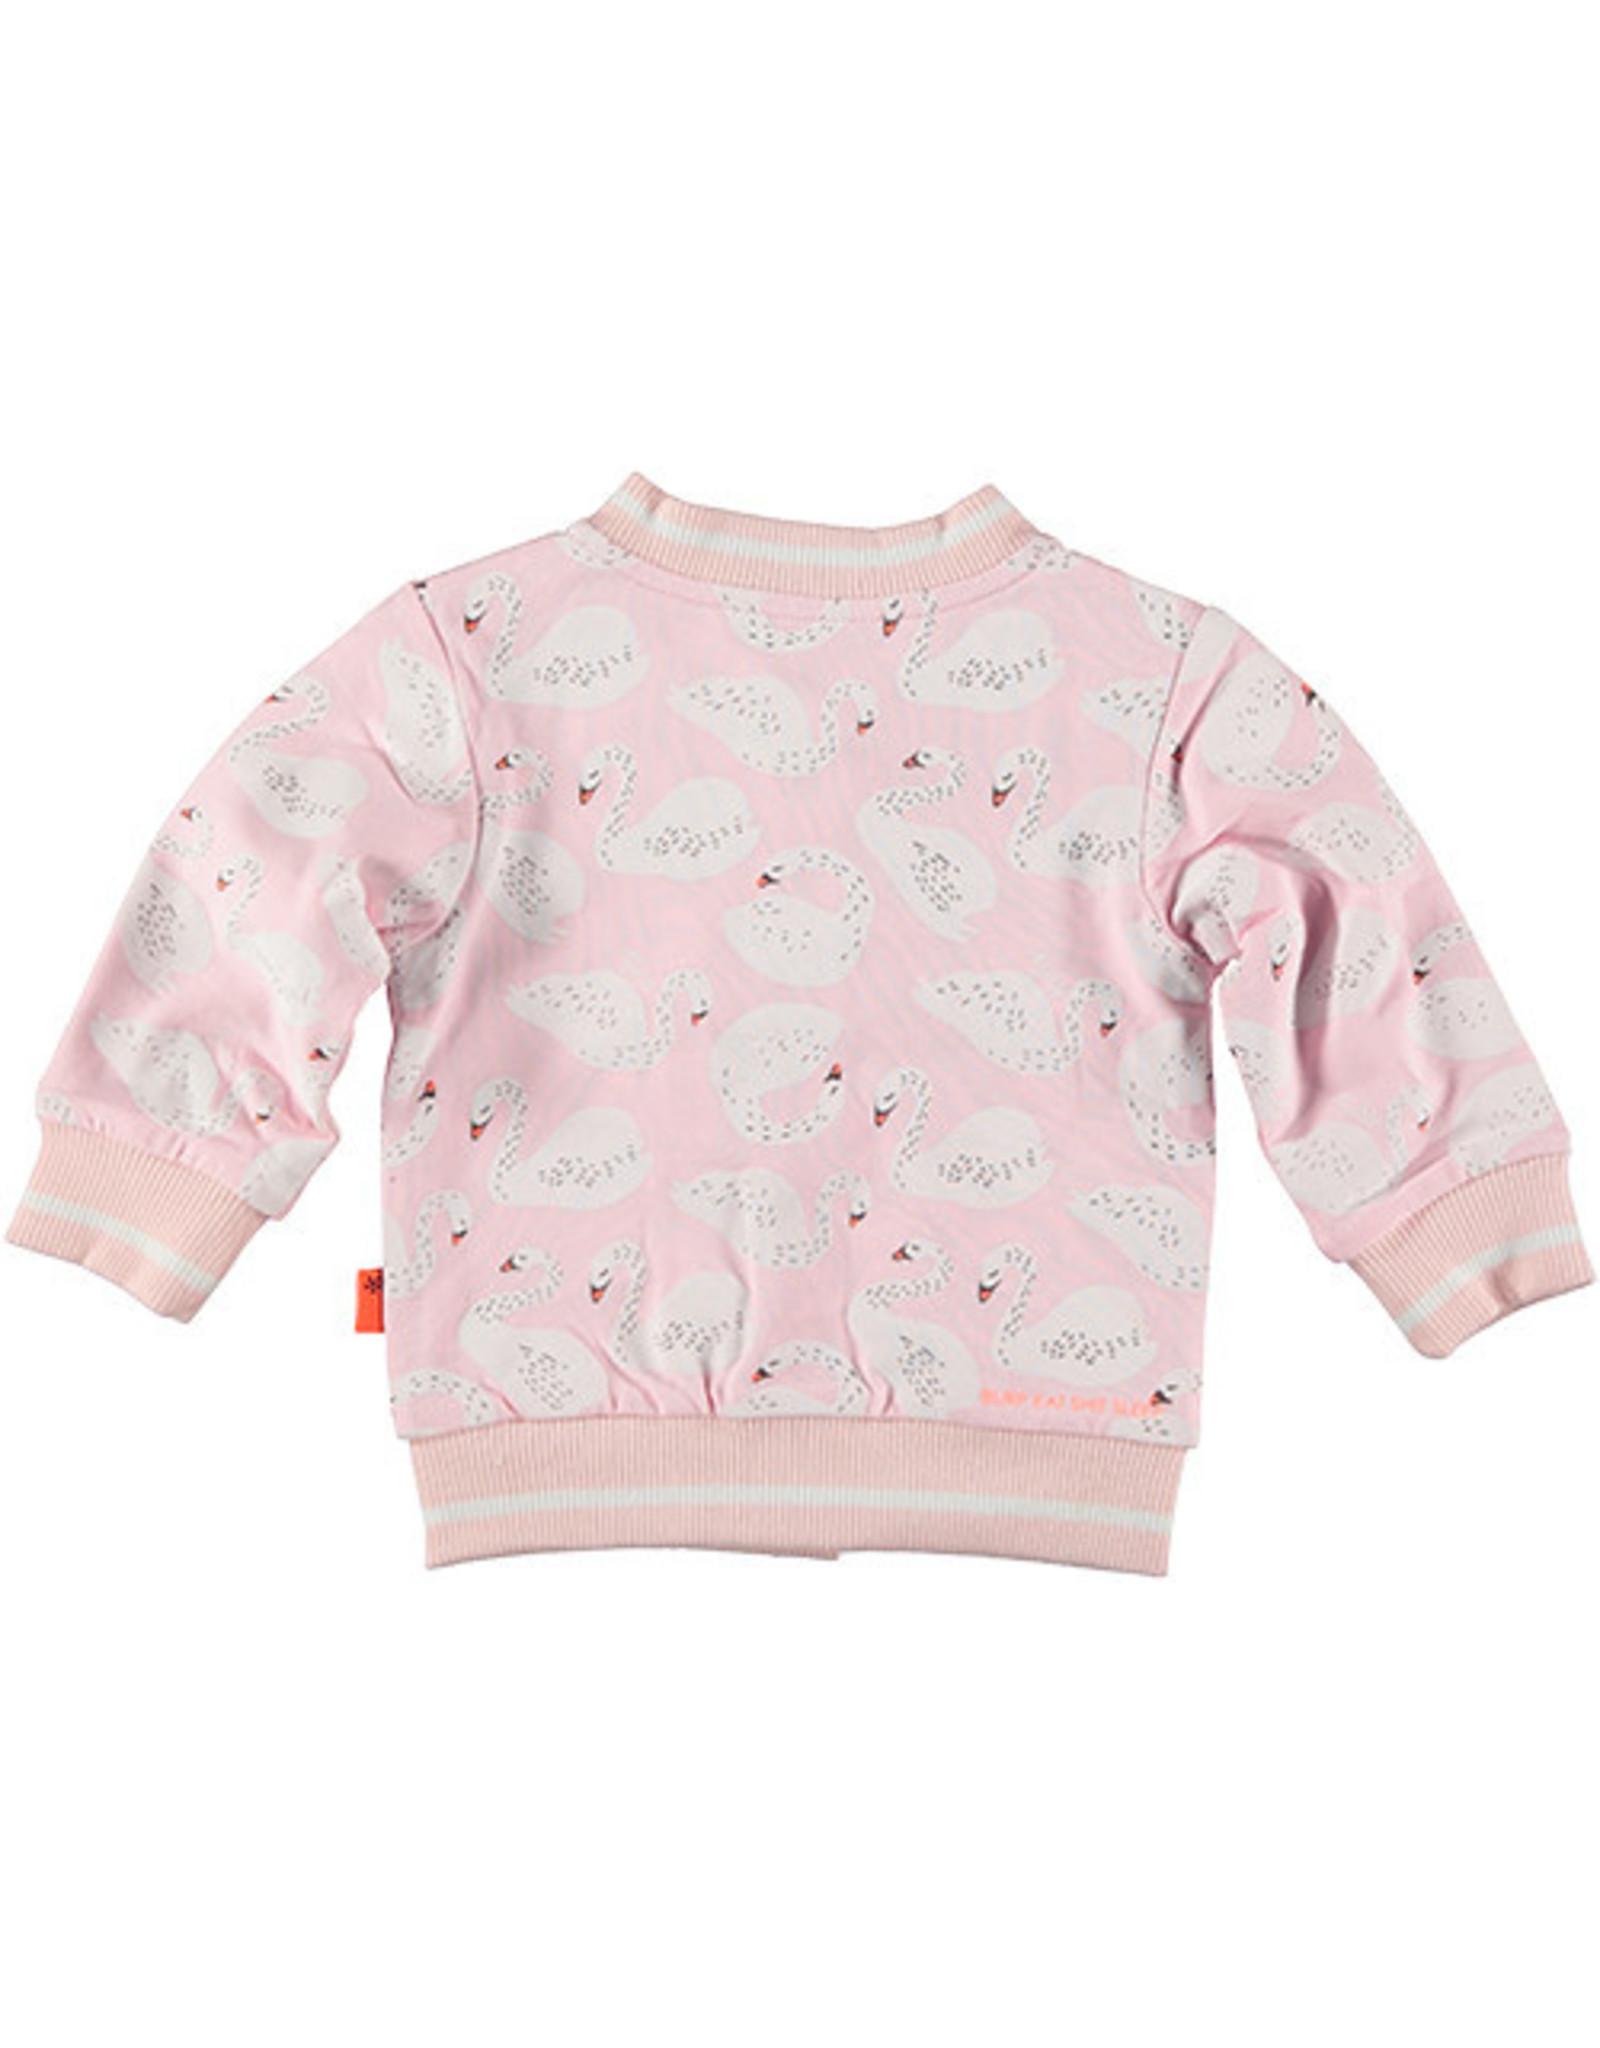 BESS Cardigan Reversible Swan/Dots 007 Pink